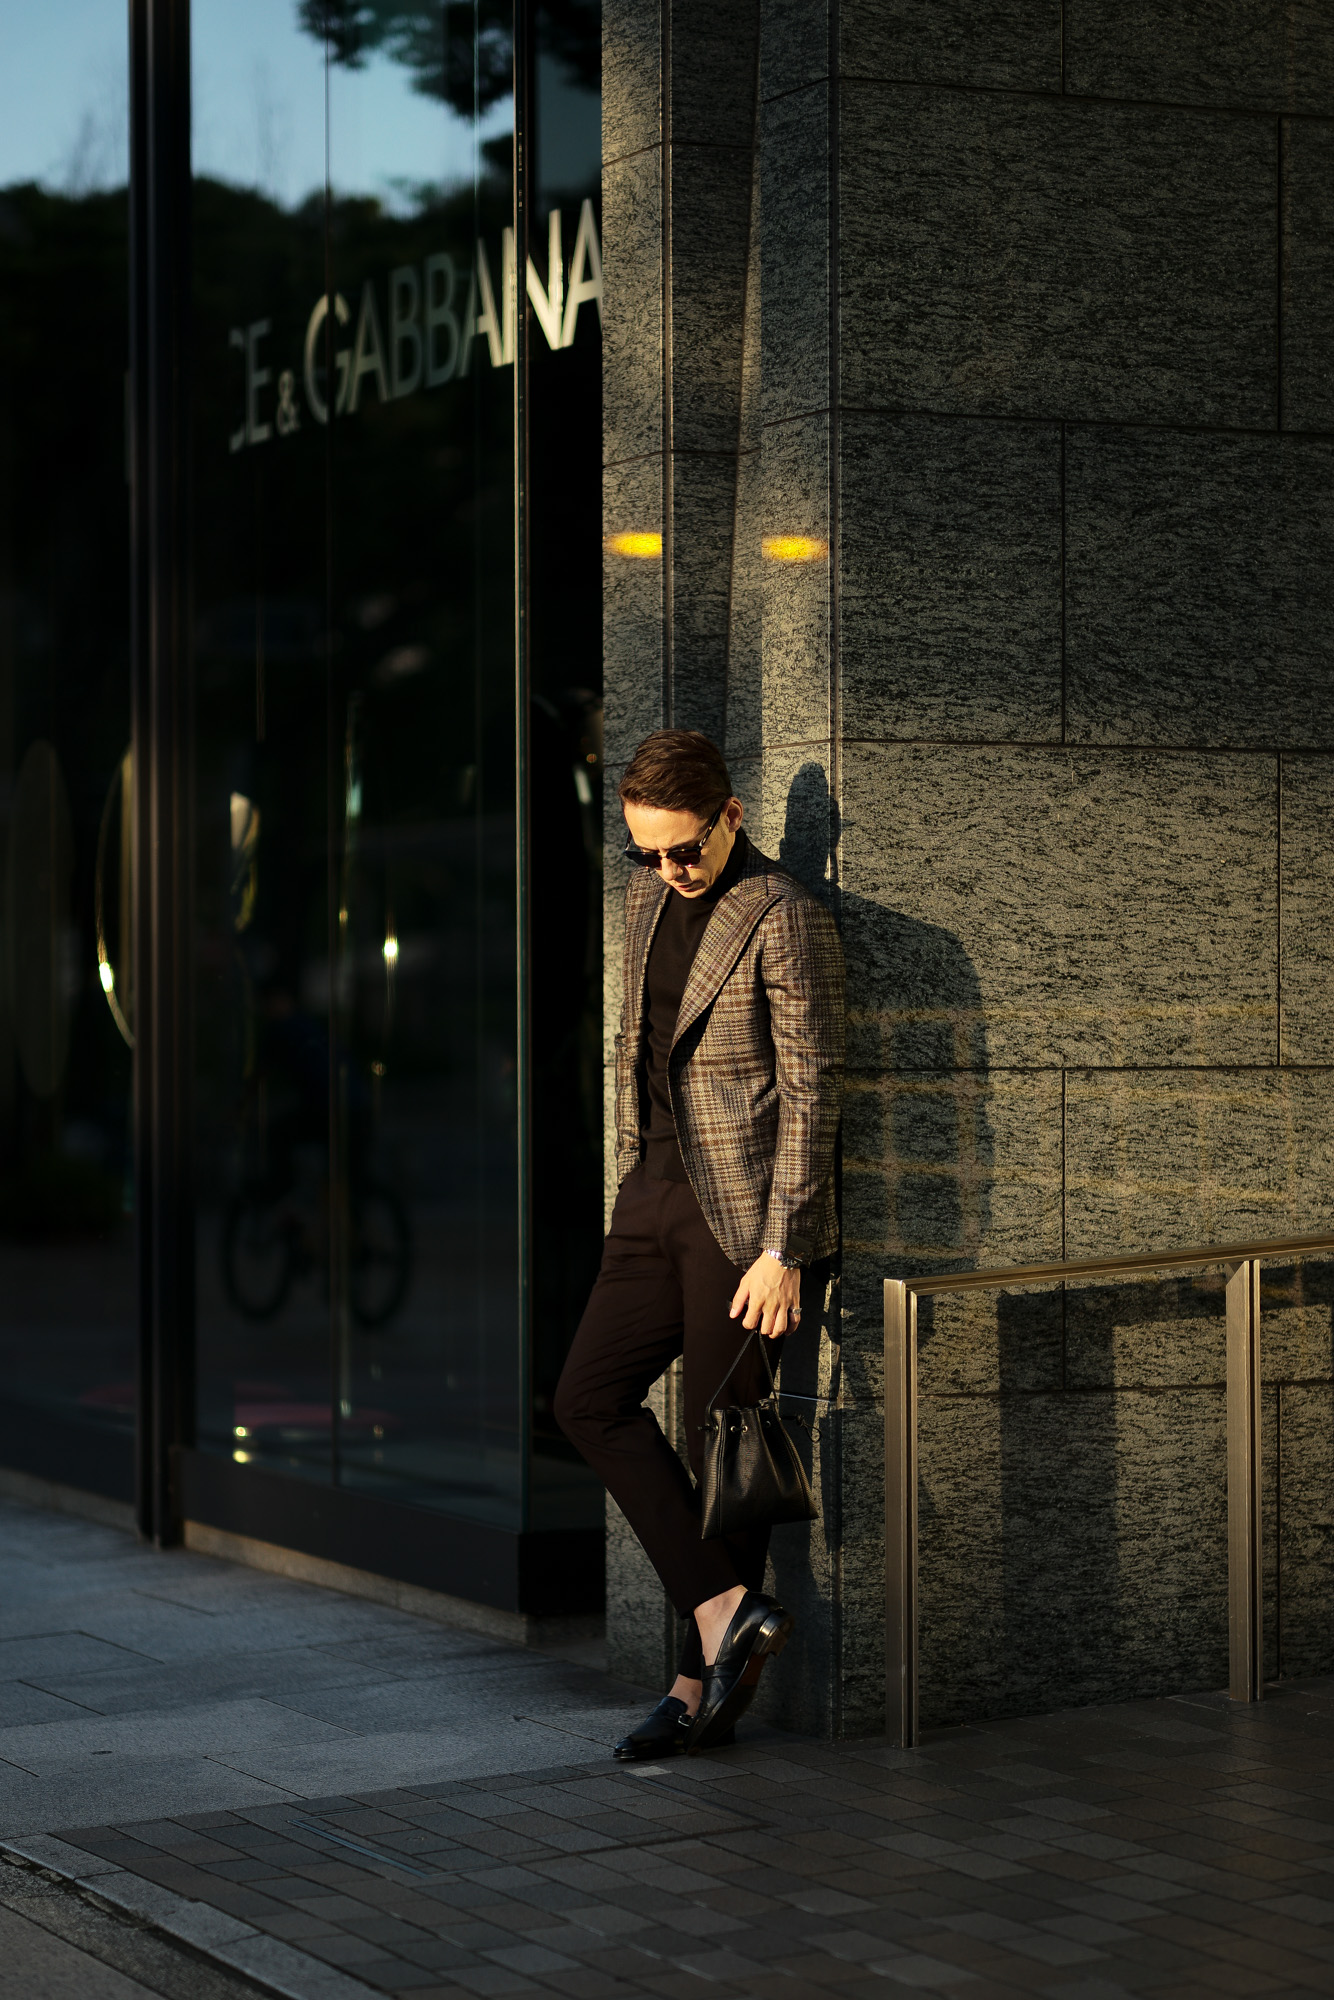 cuervo bopoha (クエルボ ヴァローナ) FLOYD (フロイド) Lizard Leather (リザードレザー) レザードローストリングバック 巾着 BLACK (ブラック) Made in Japan (日本製) 2020秋冬【Special Model】 愛知 名古屋 altoediritto アルトエデリット レザーバック スモールバック エキゾチックレザー